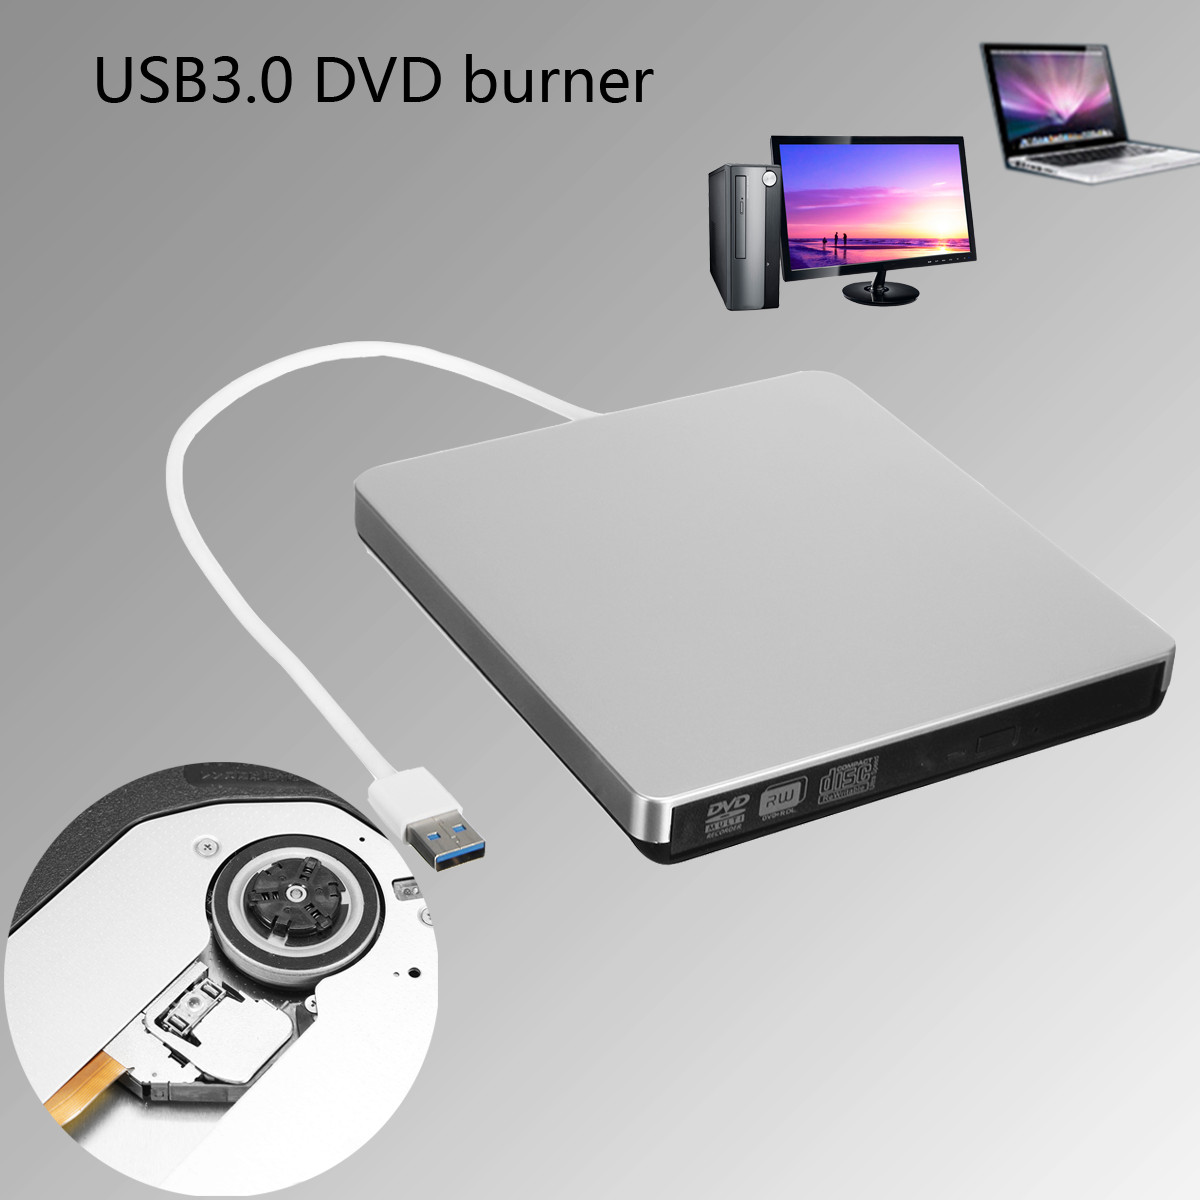 External USB 3.0 DVD CD-RW Drive Writer Burner DVD Player Optical Drives For Laptop Desktop PC